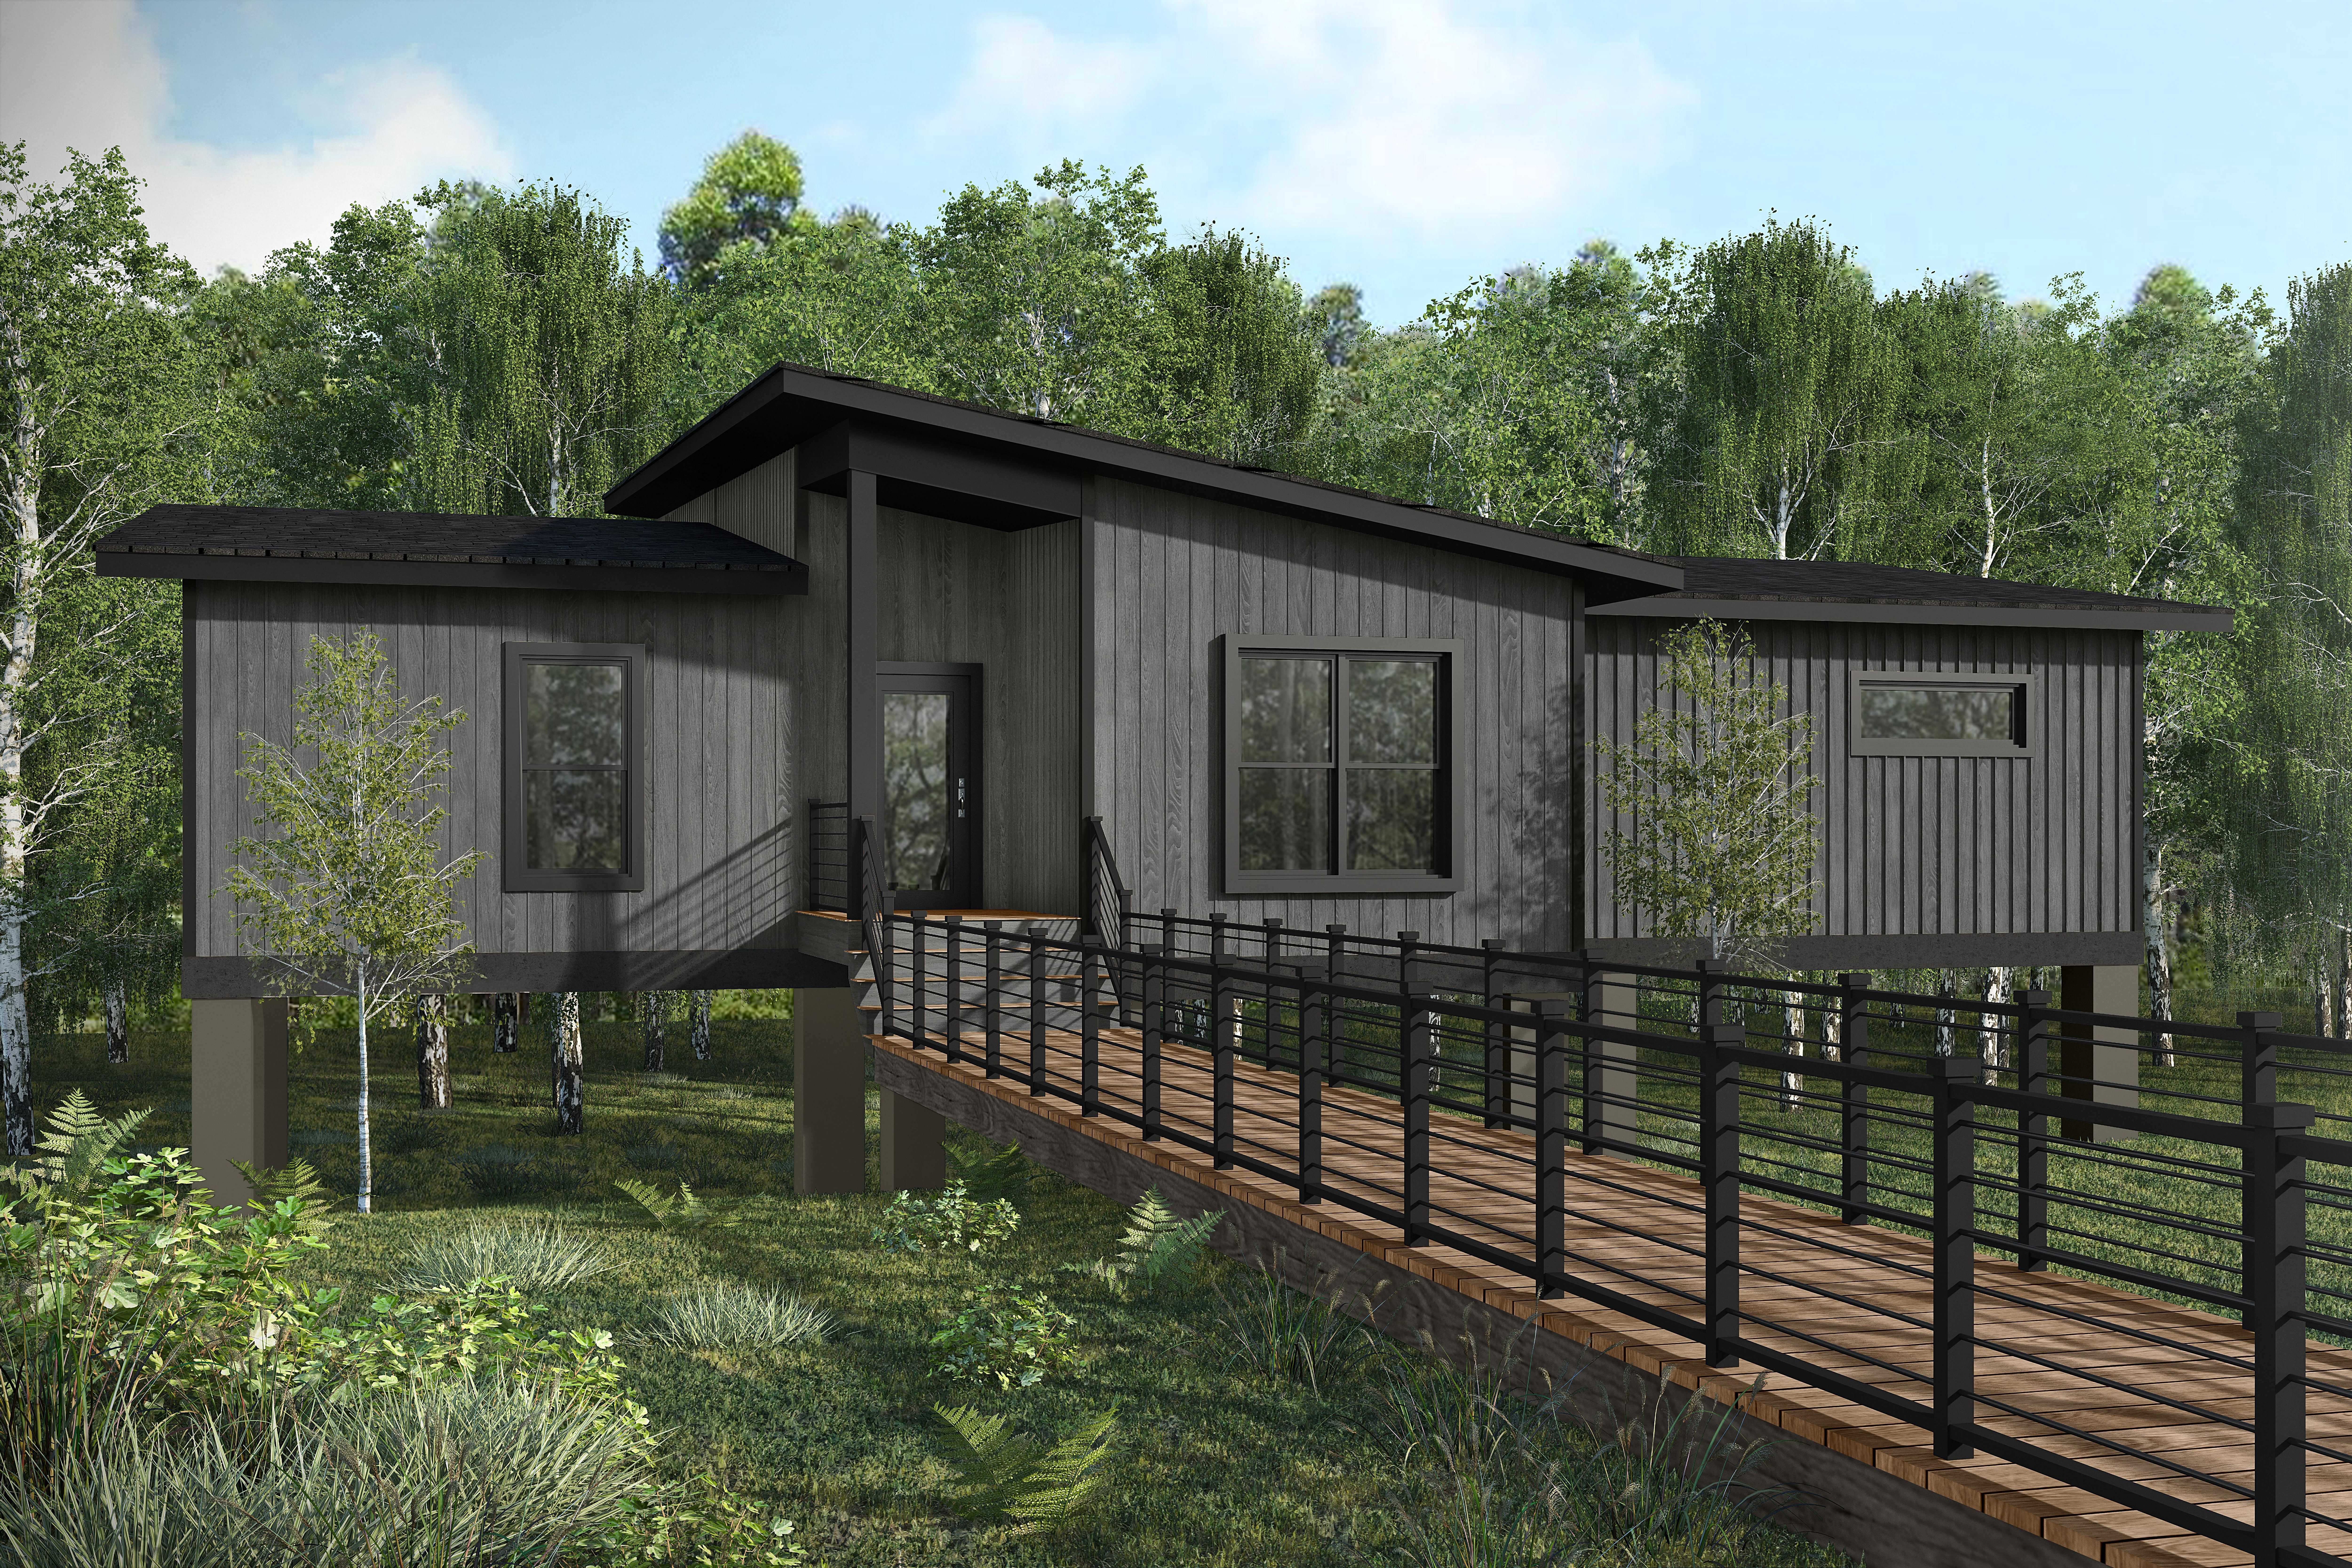 rendering of treehouse 3 bedroom model at Innsbrook resort in missouri